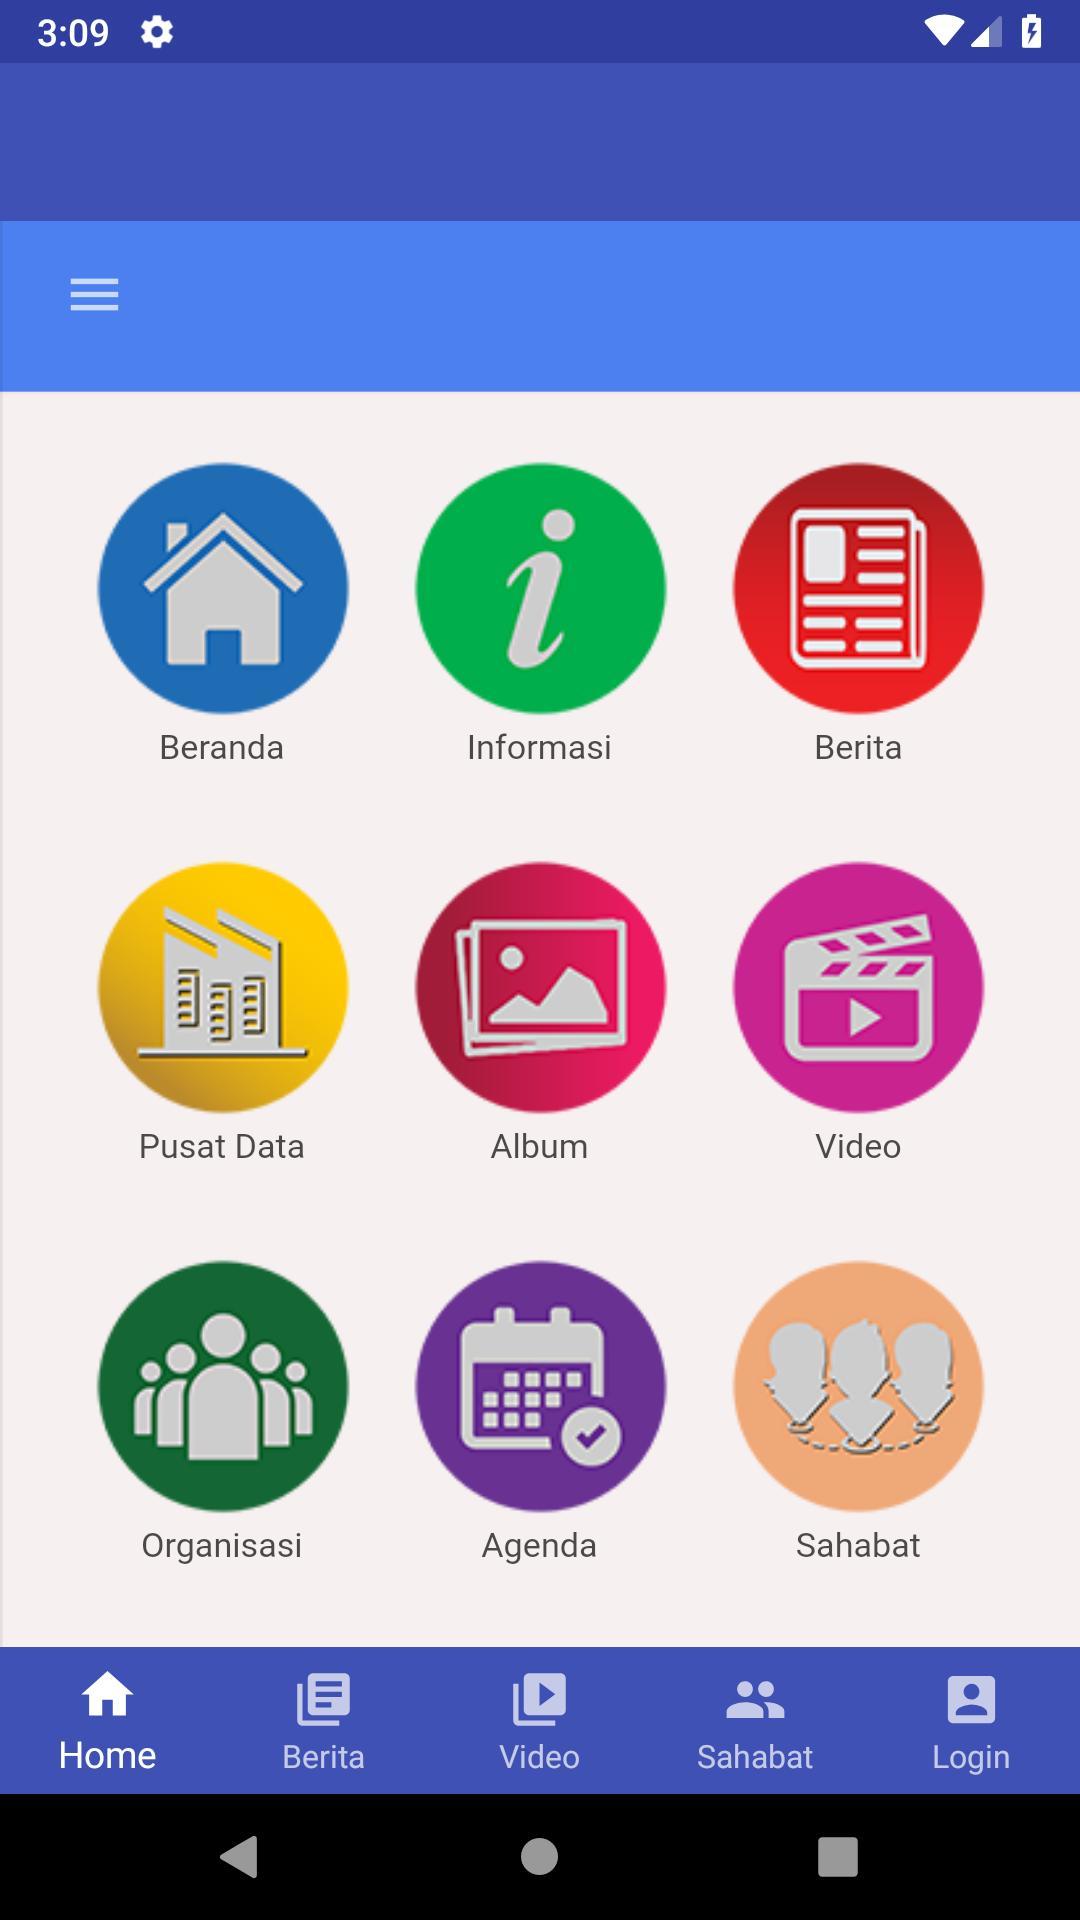 Sman 23 Kabupaten Tangerang For Android Apk Download